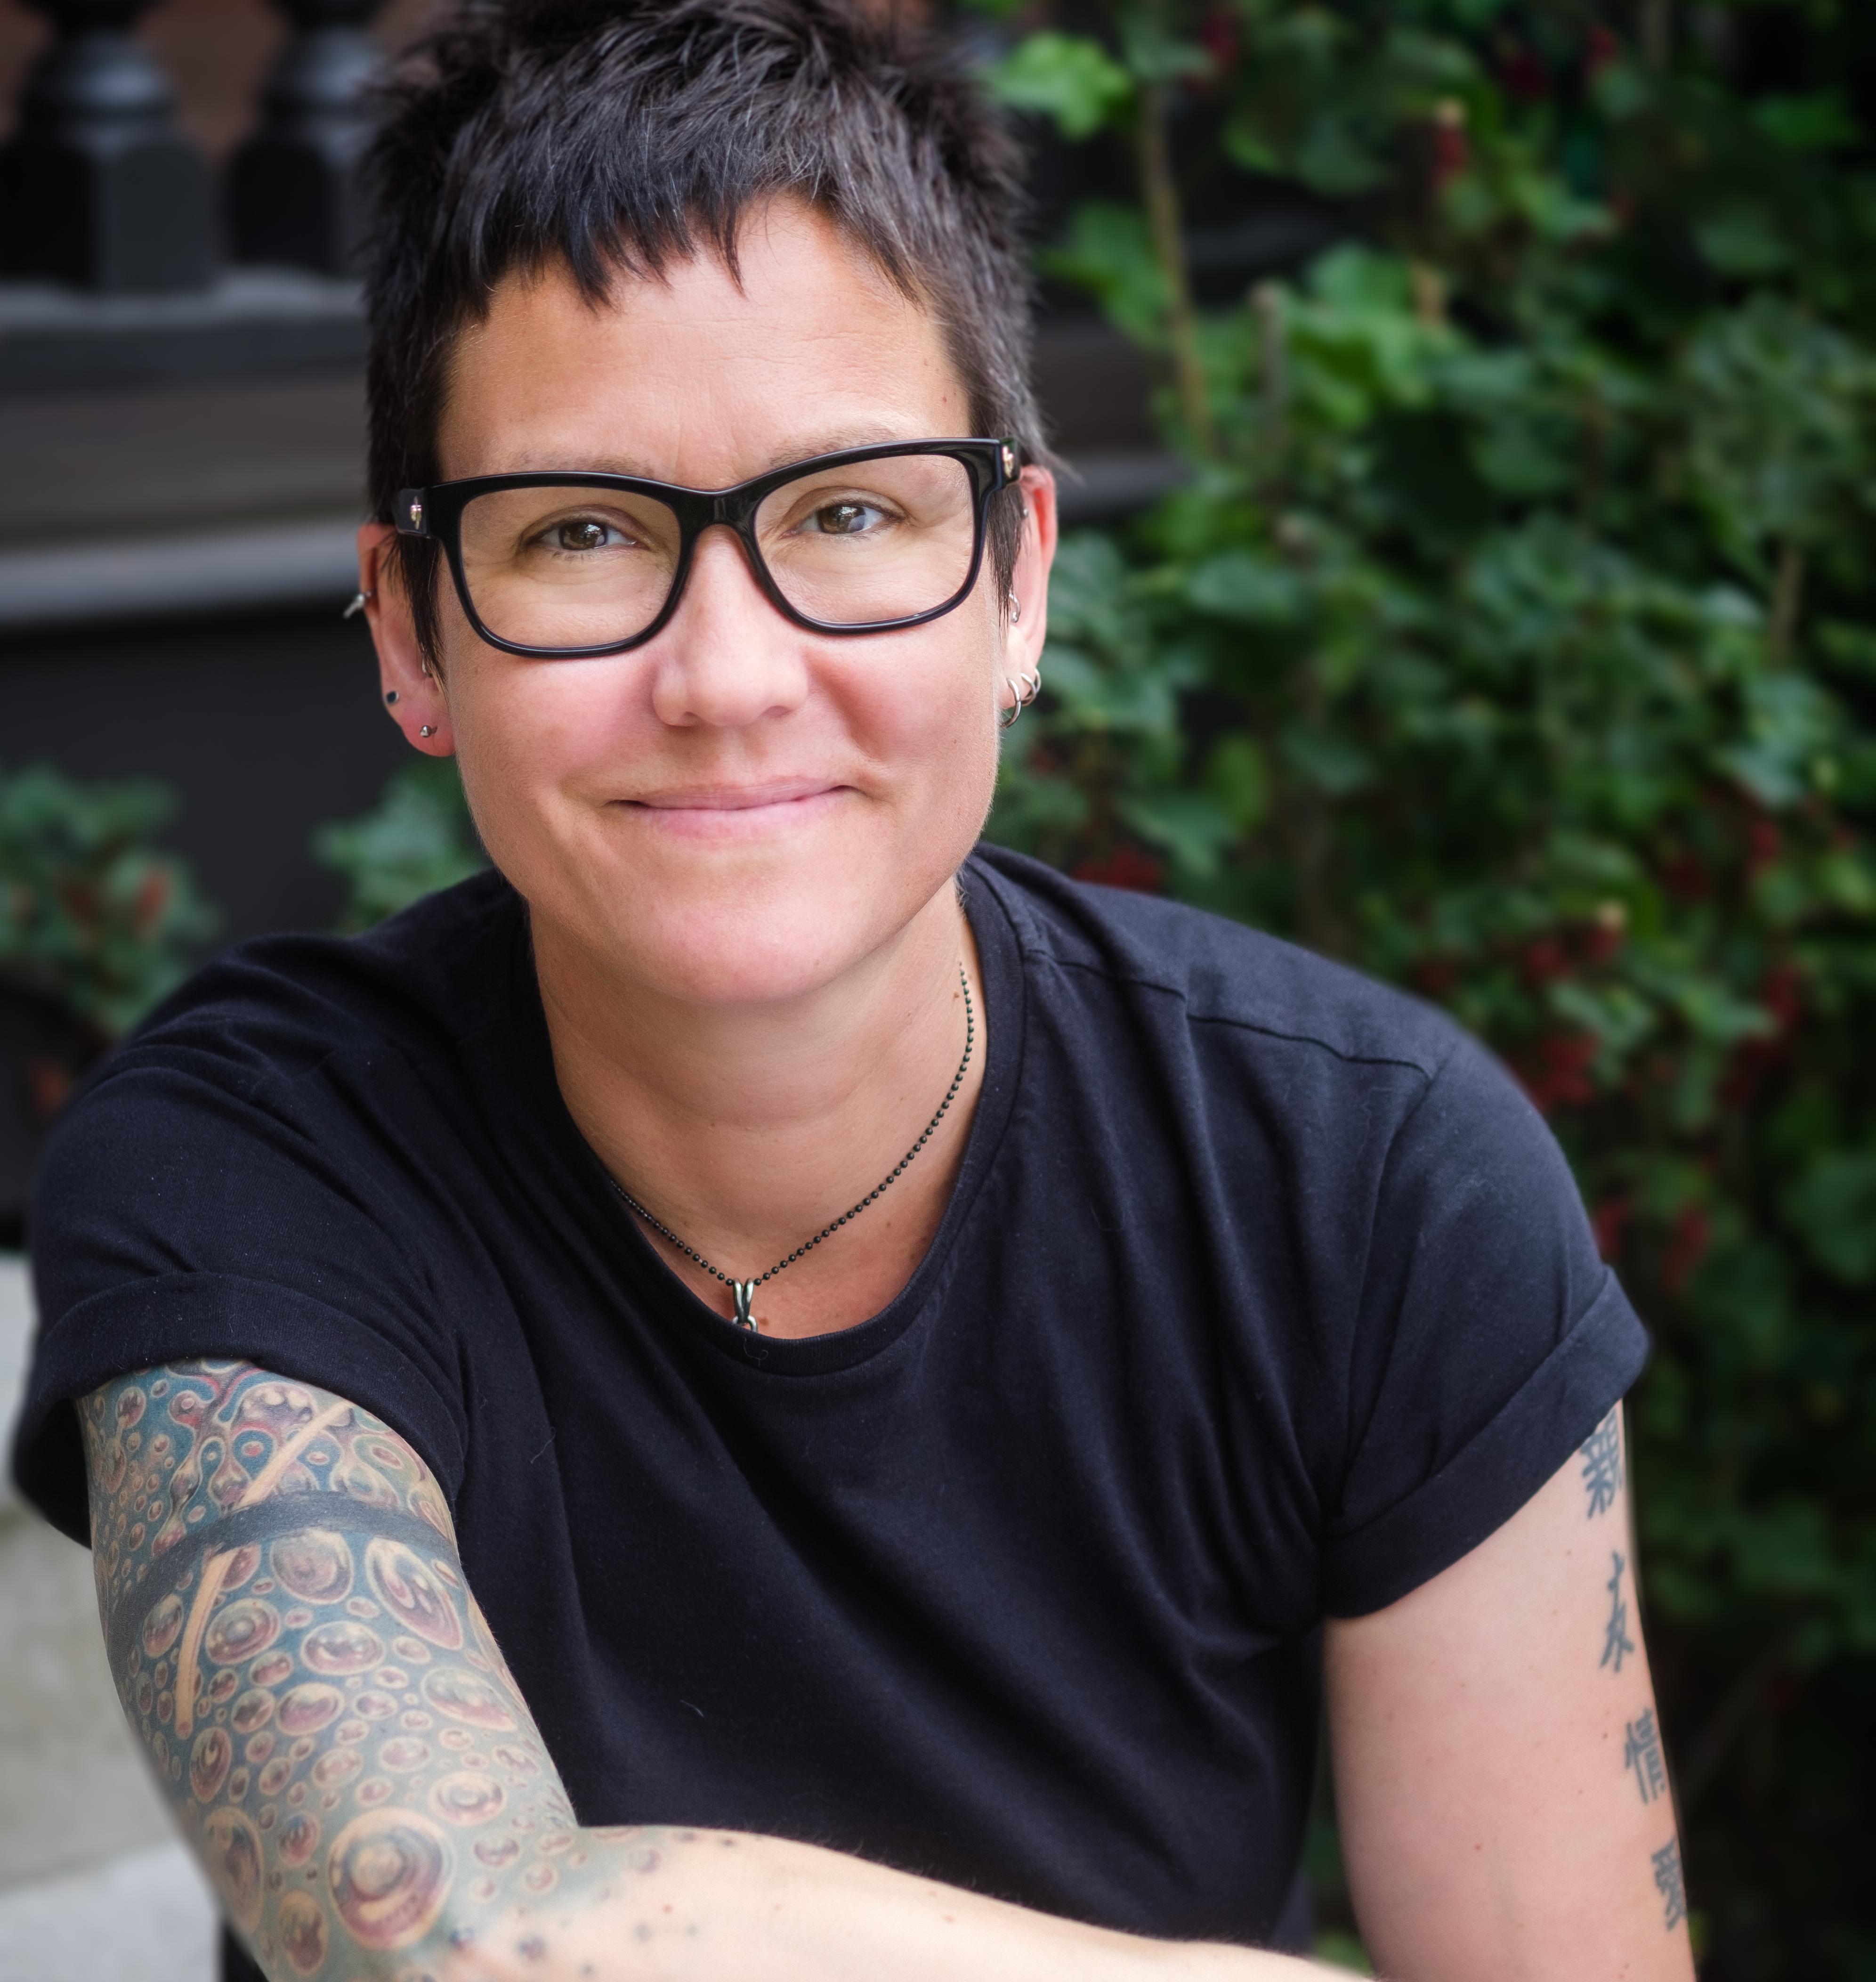 Helen Tweddle, Registered Social Worker, Psychotherapist